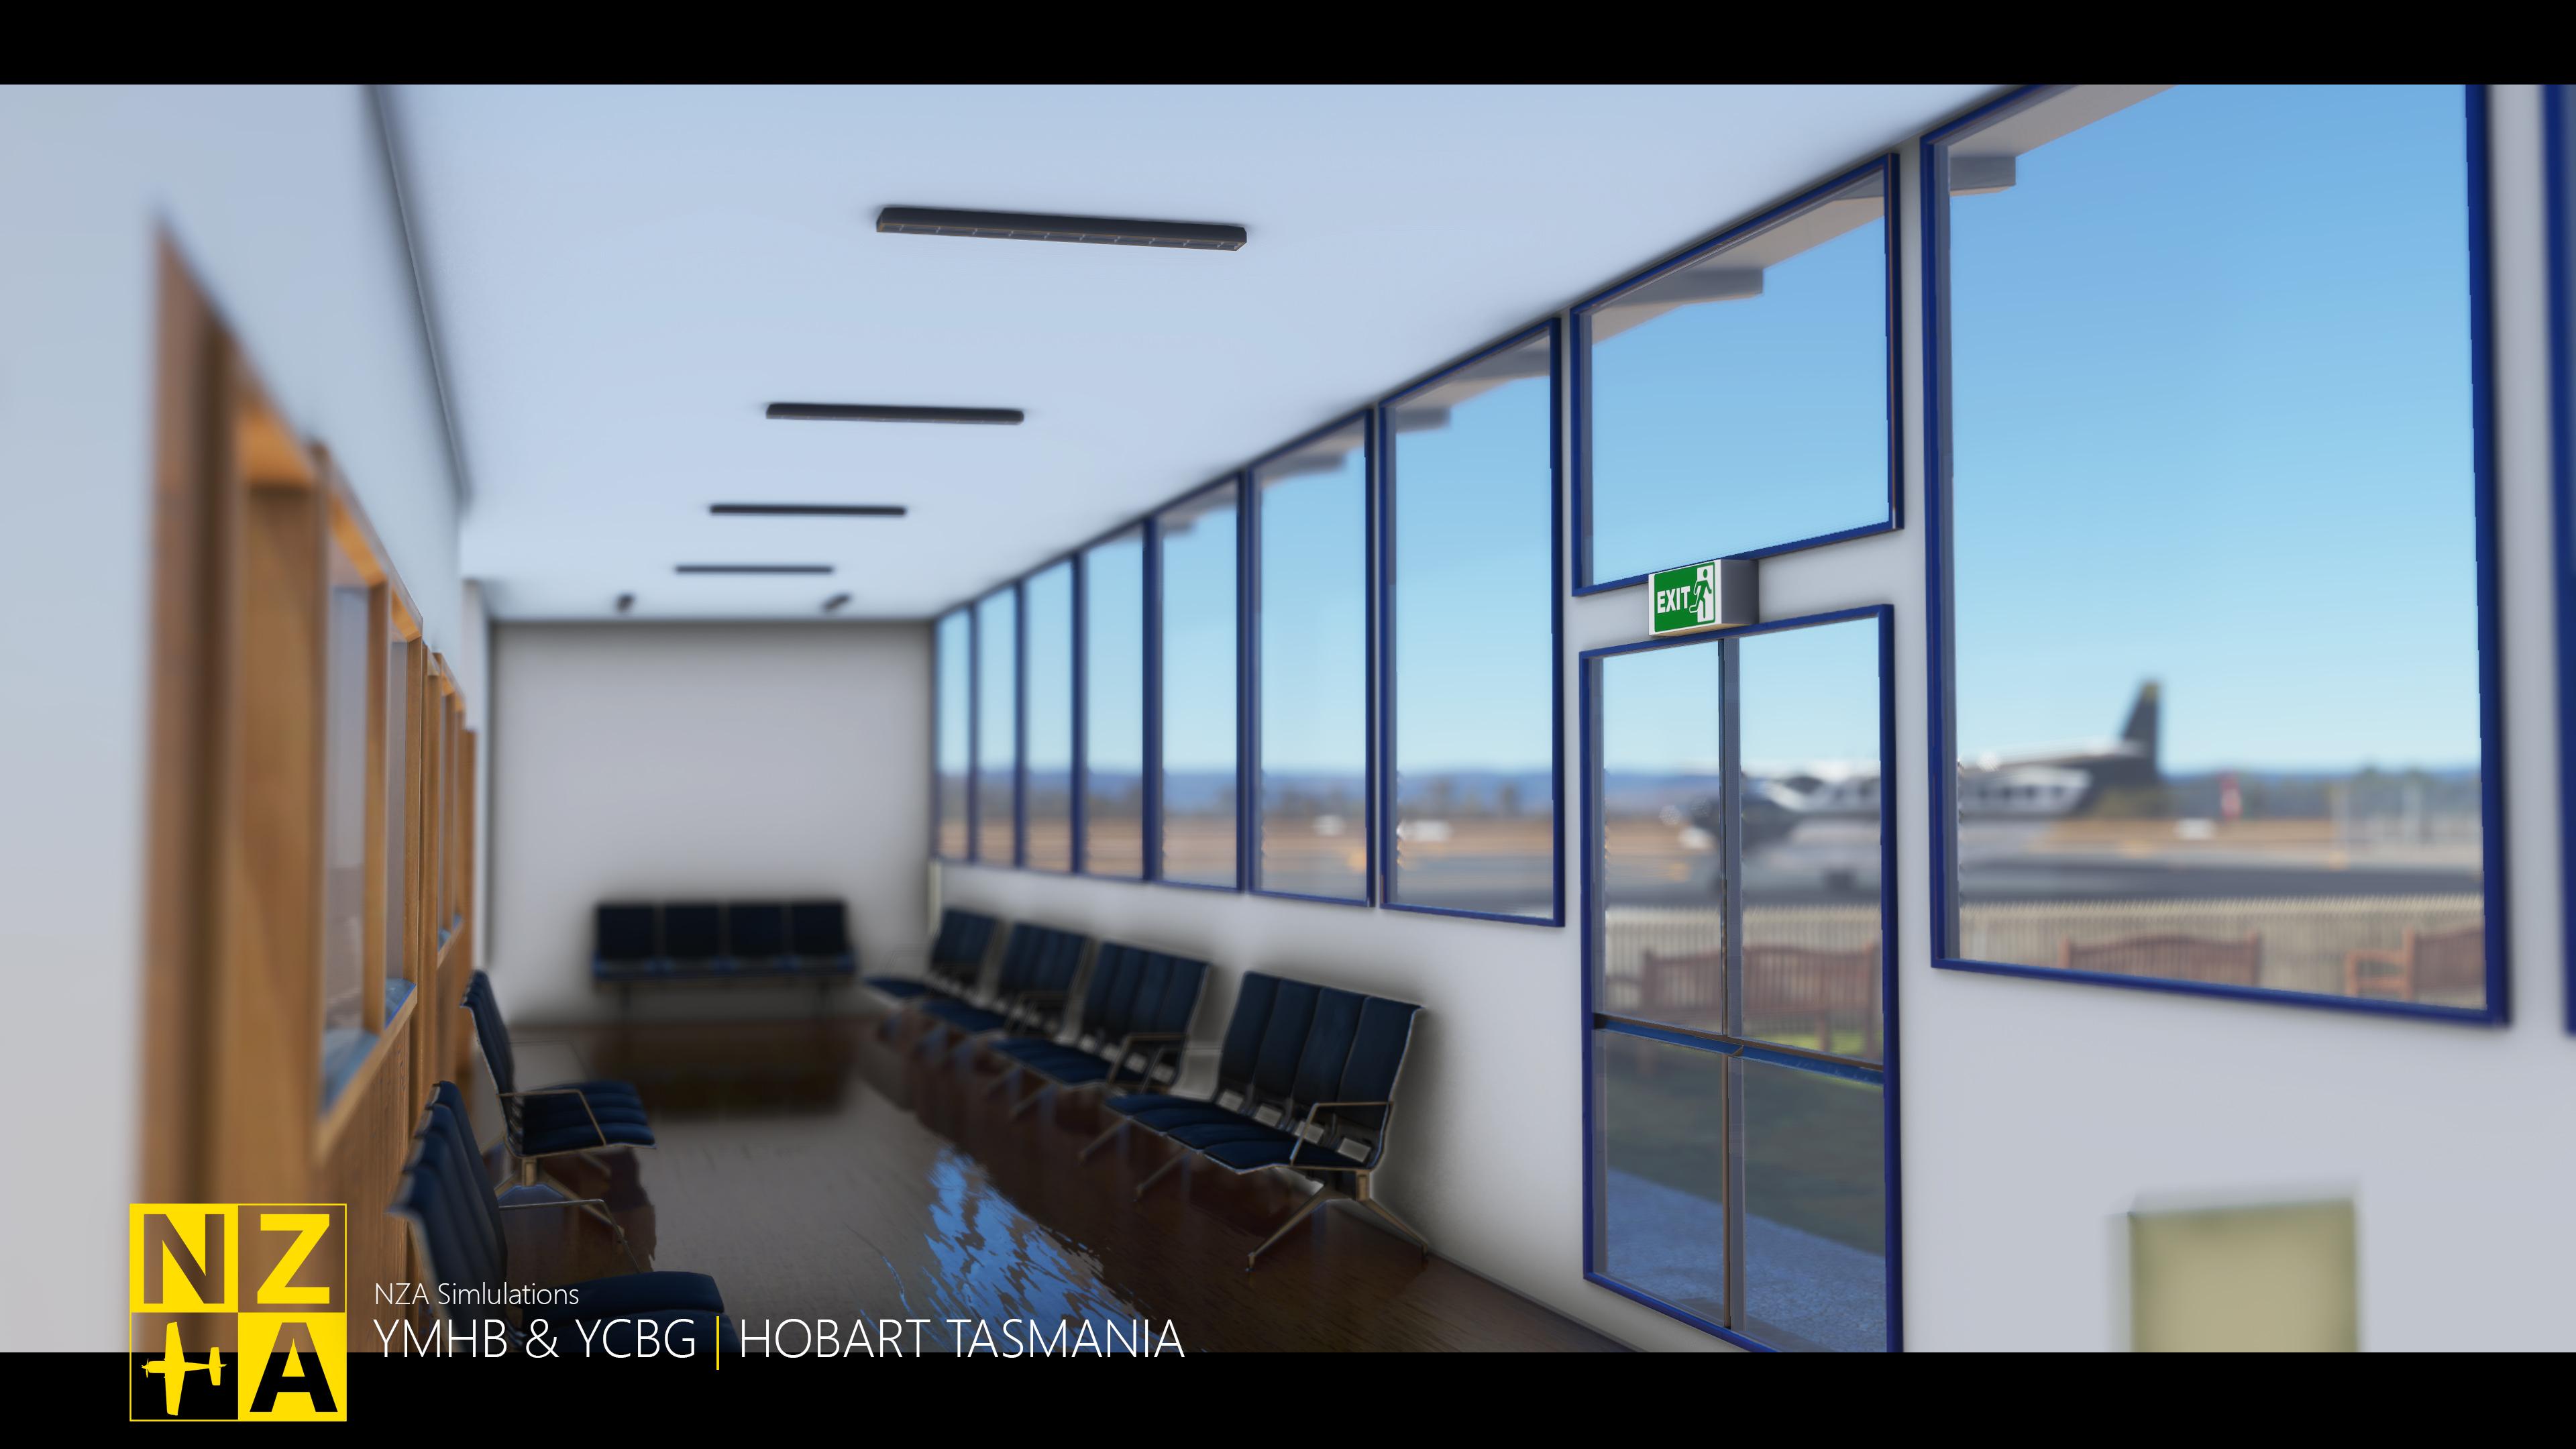 NZA Simulations - YMHB & YCBG - Par Avion Office 1.jpg